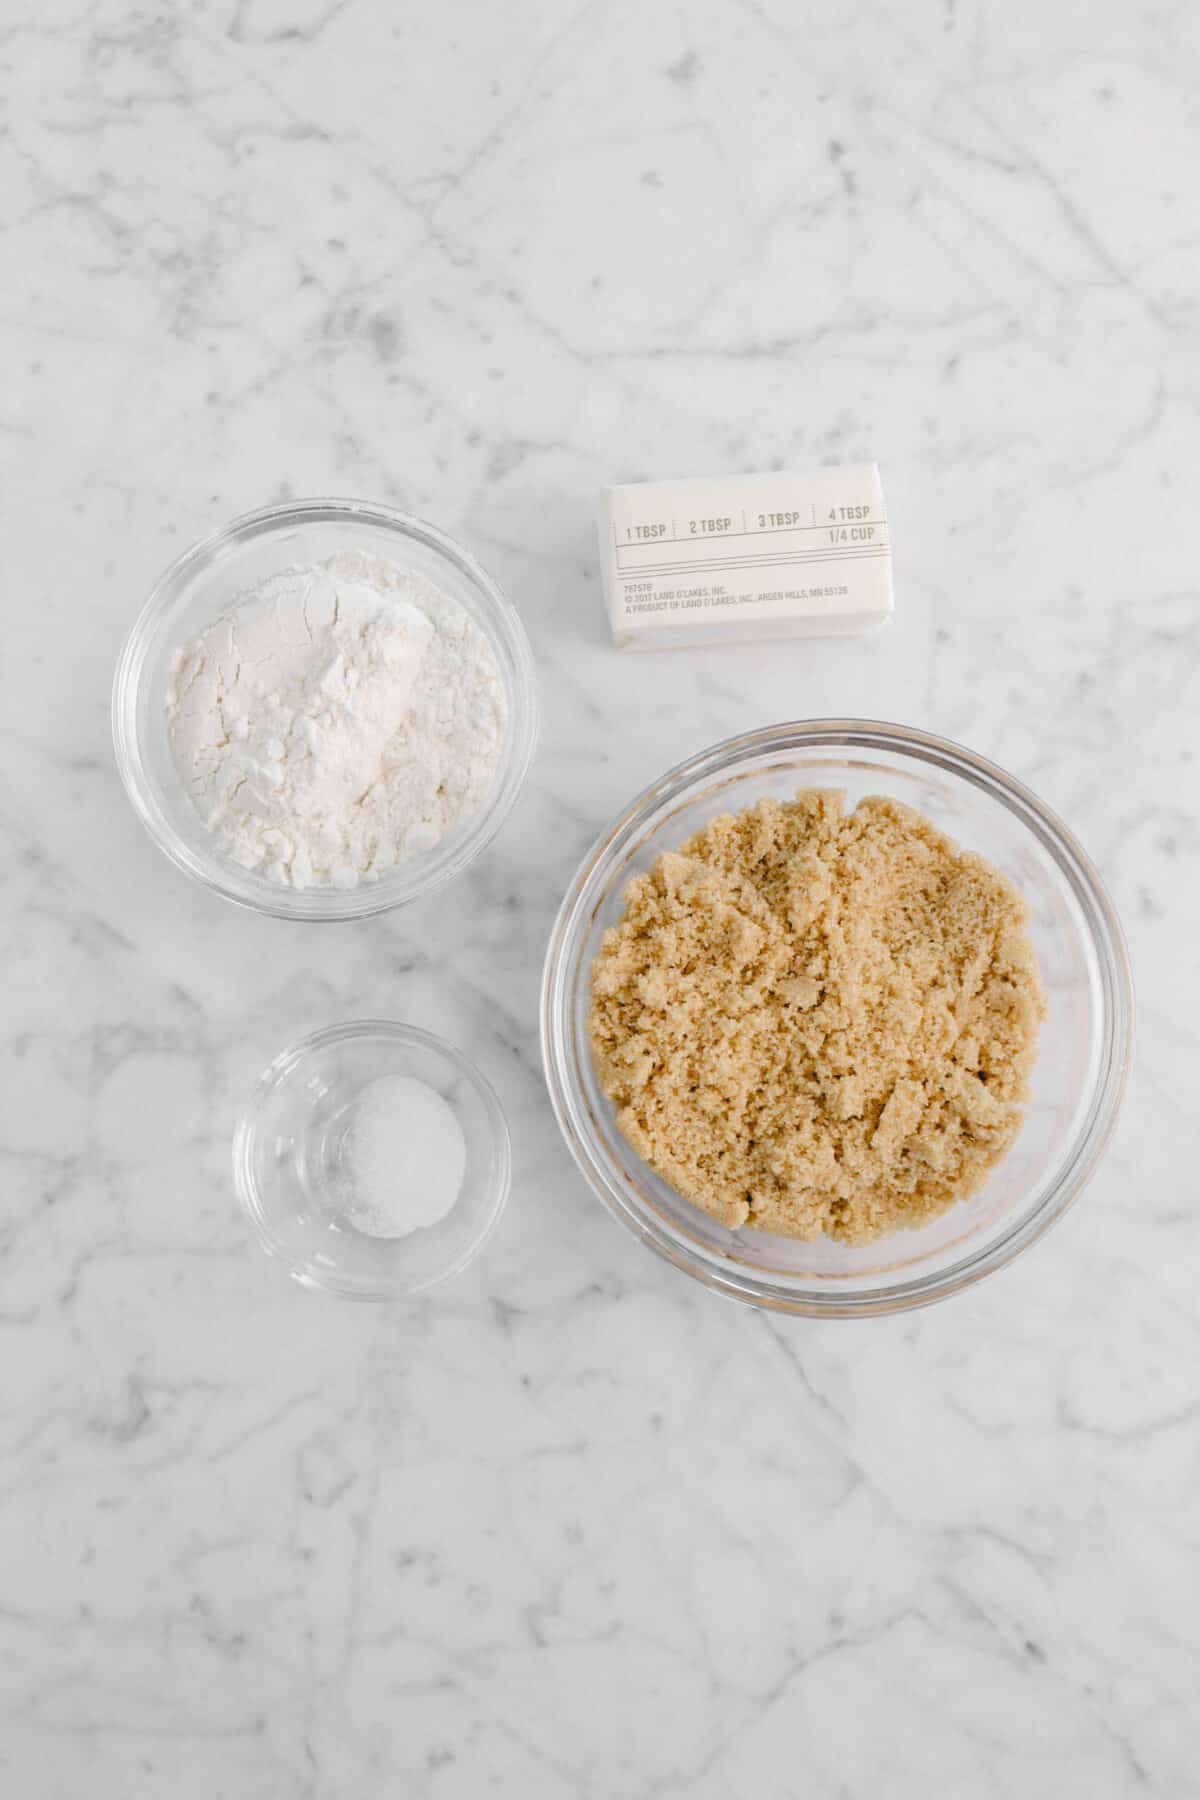 flour, butter, salt, and brown sugar in glass bowls